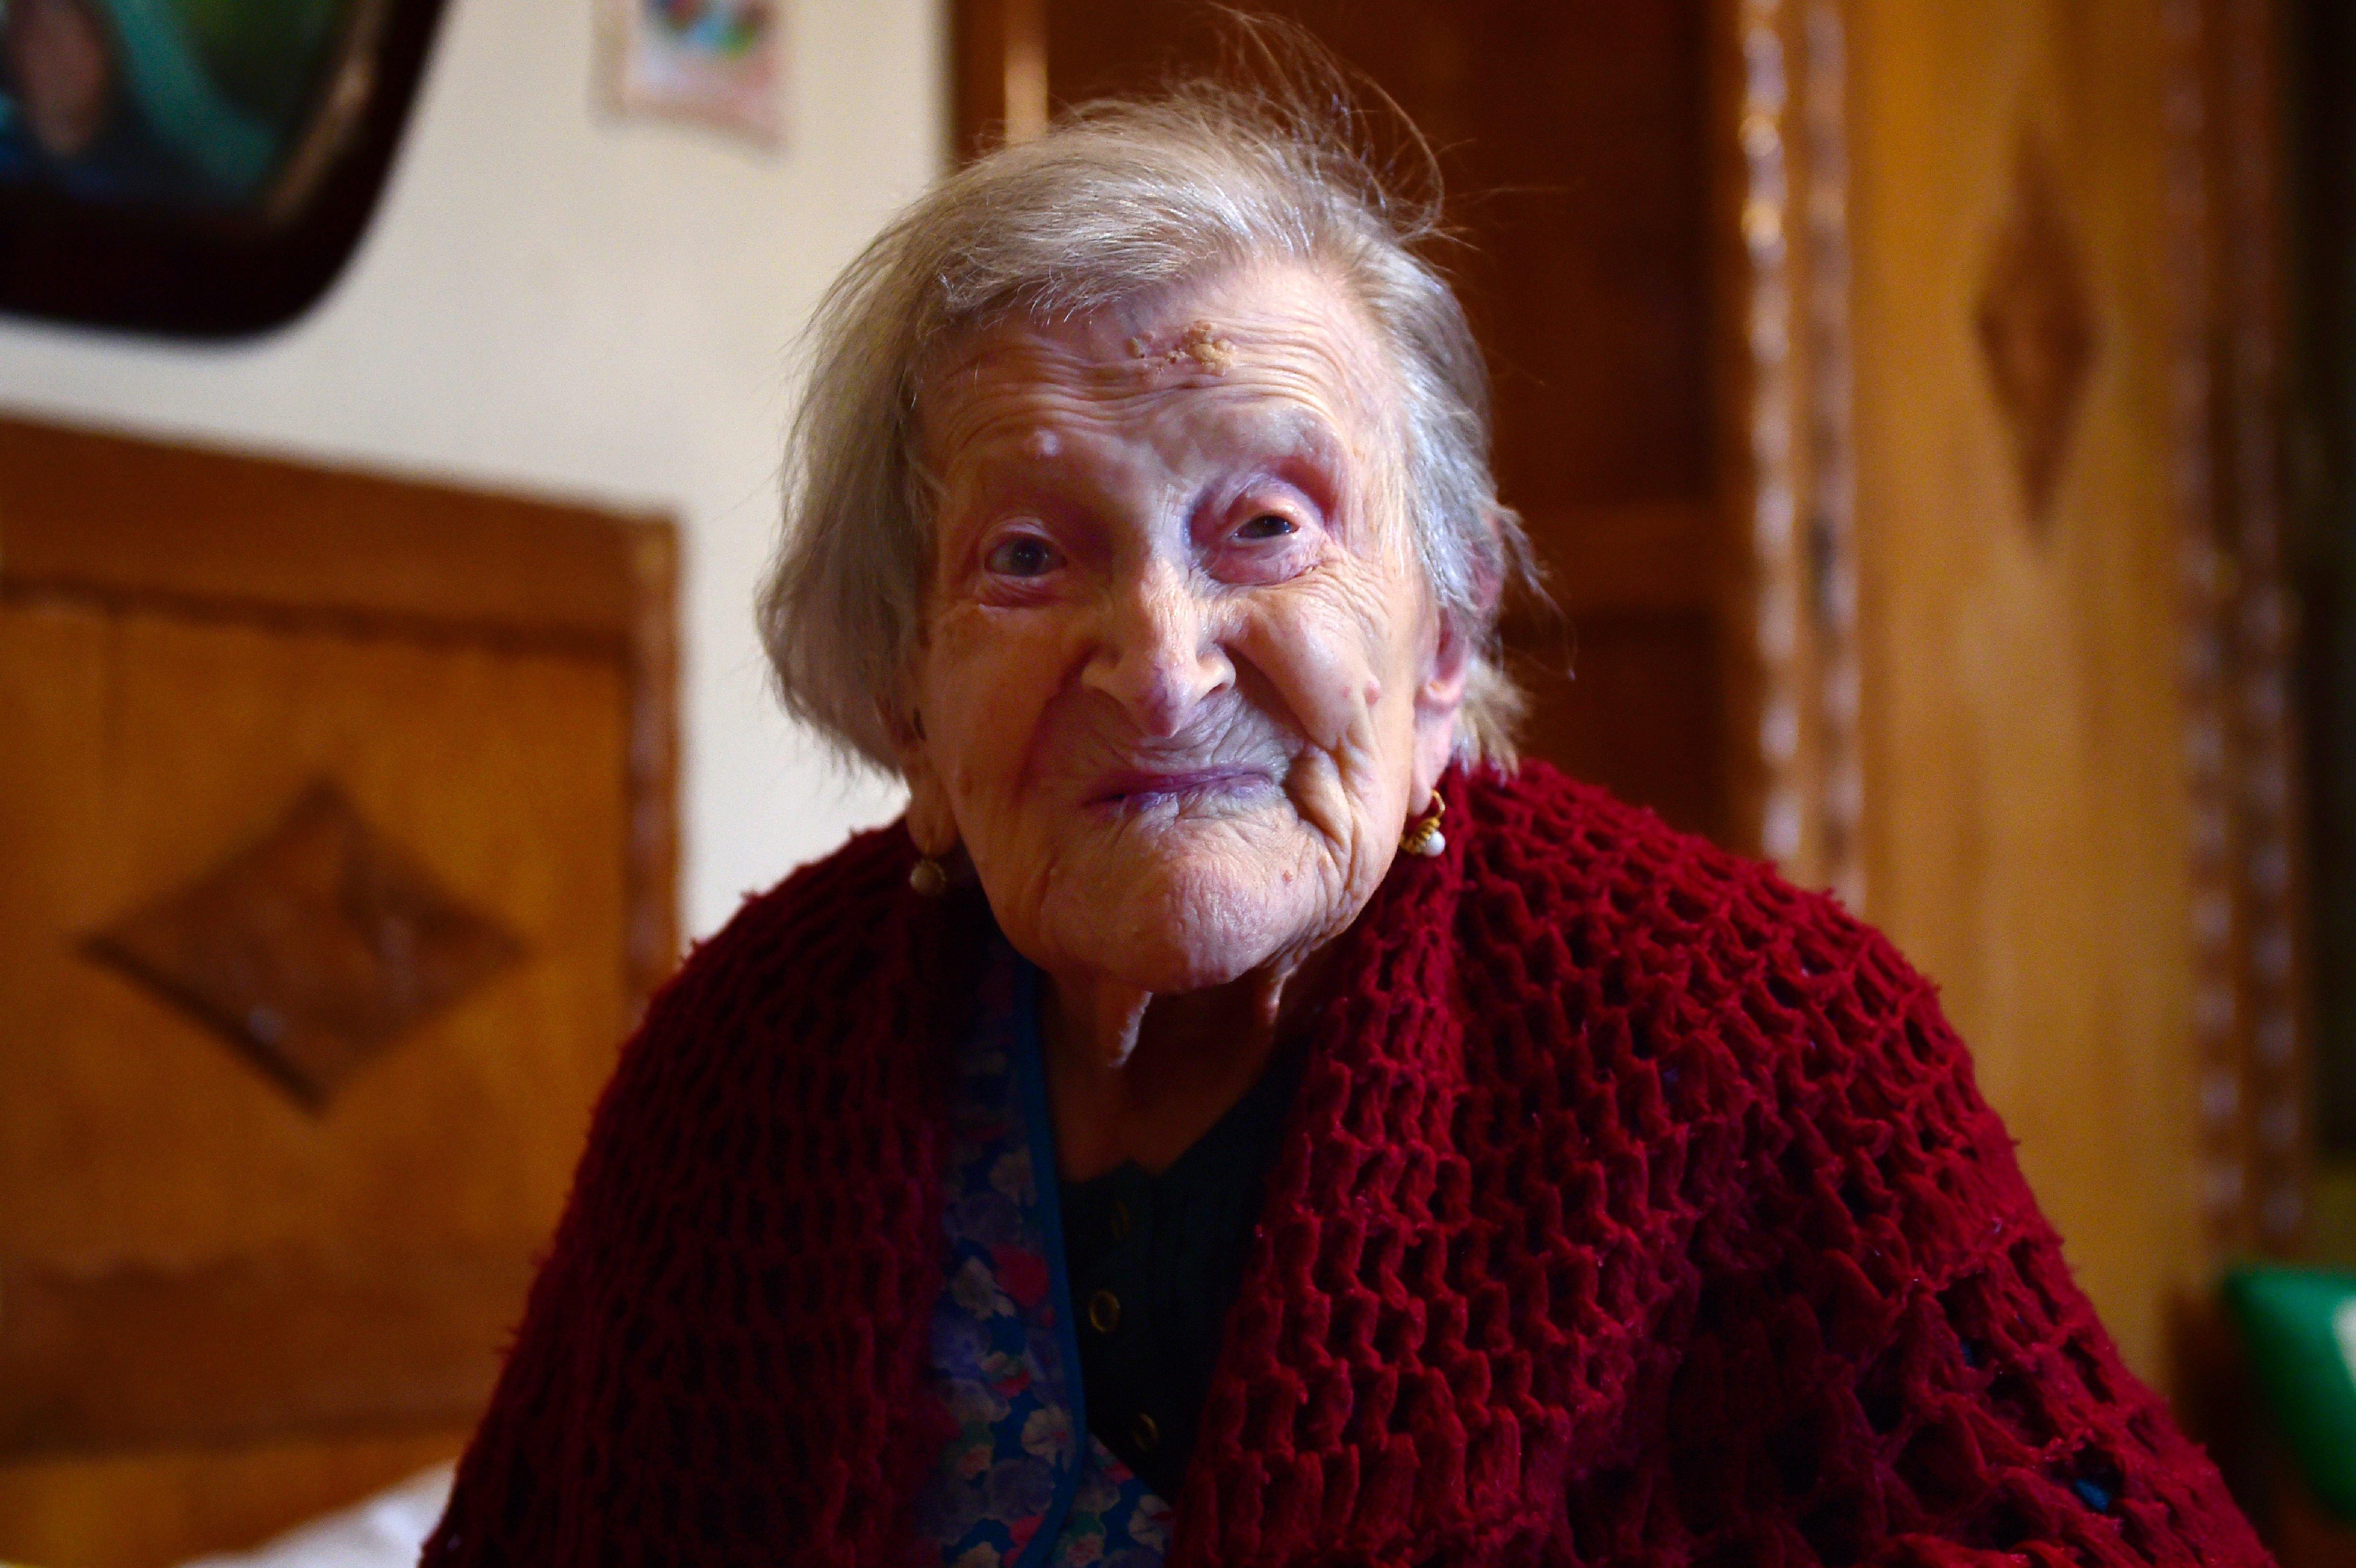 World's Oldest Person Celebrates 117th